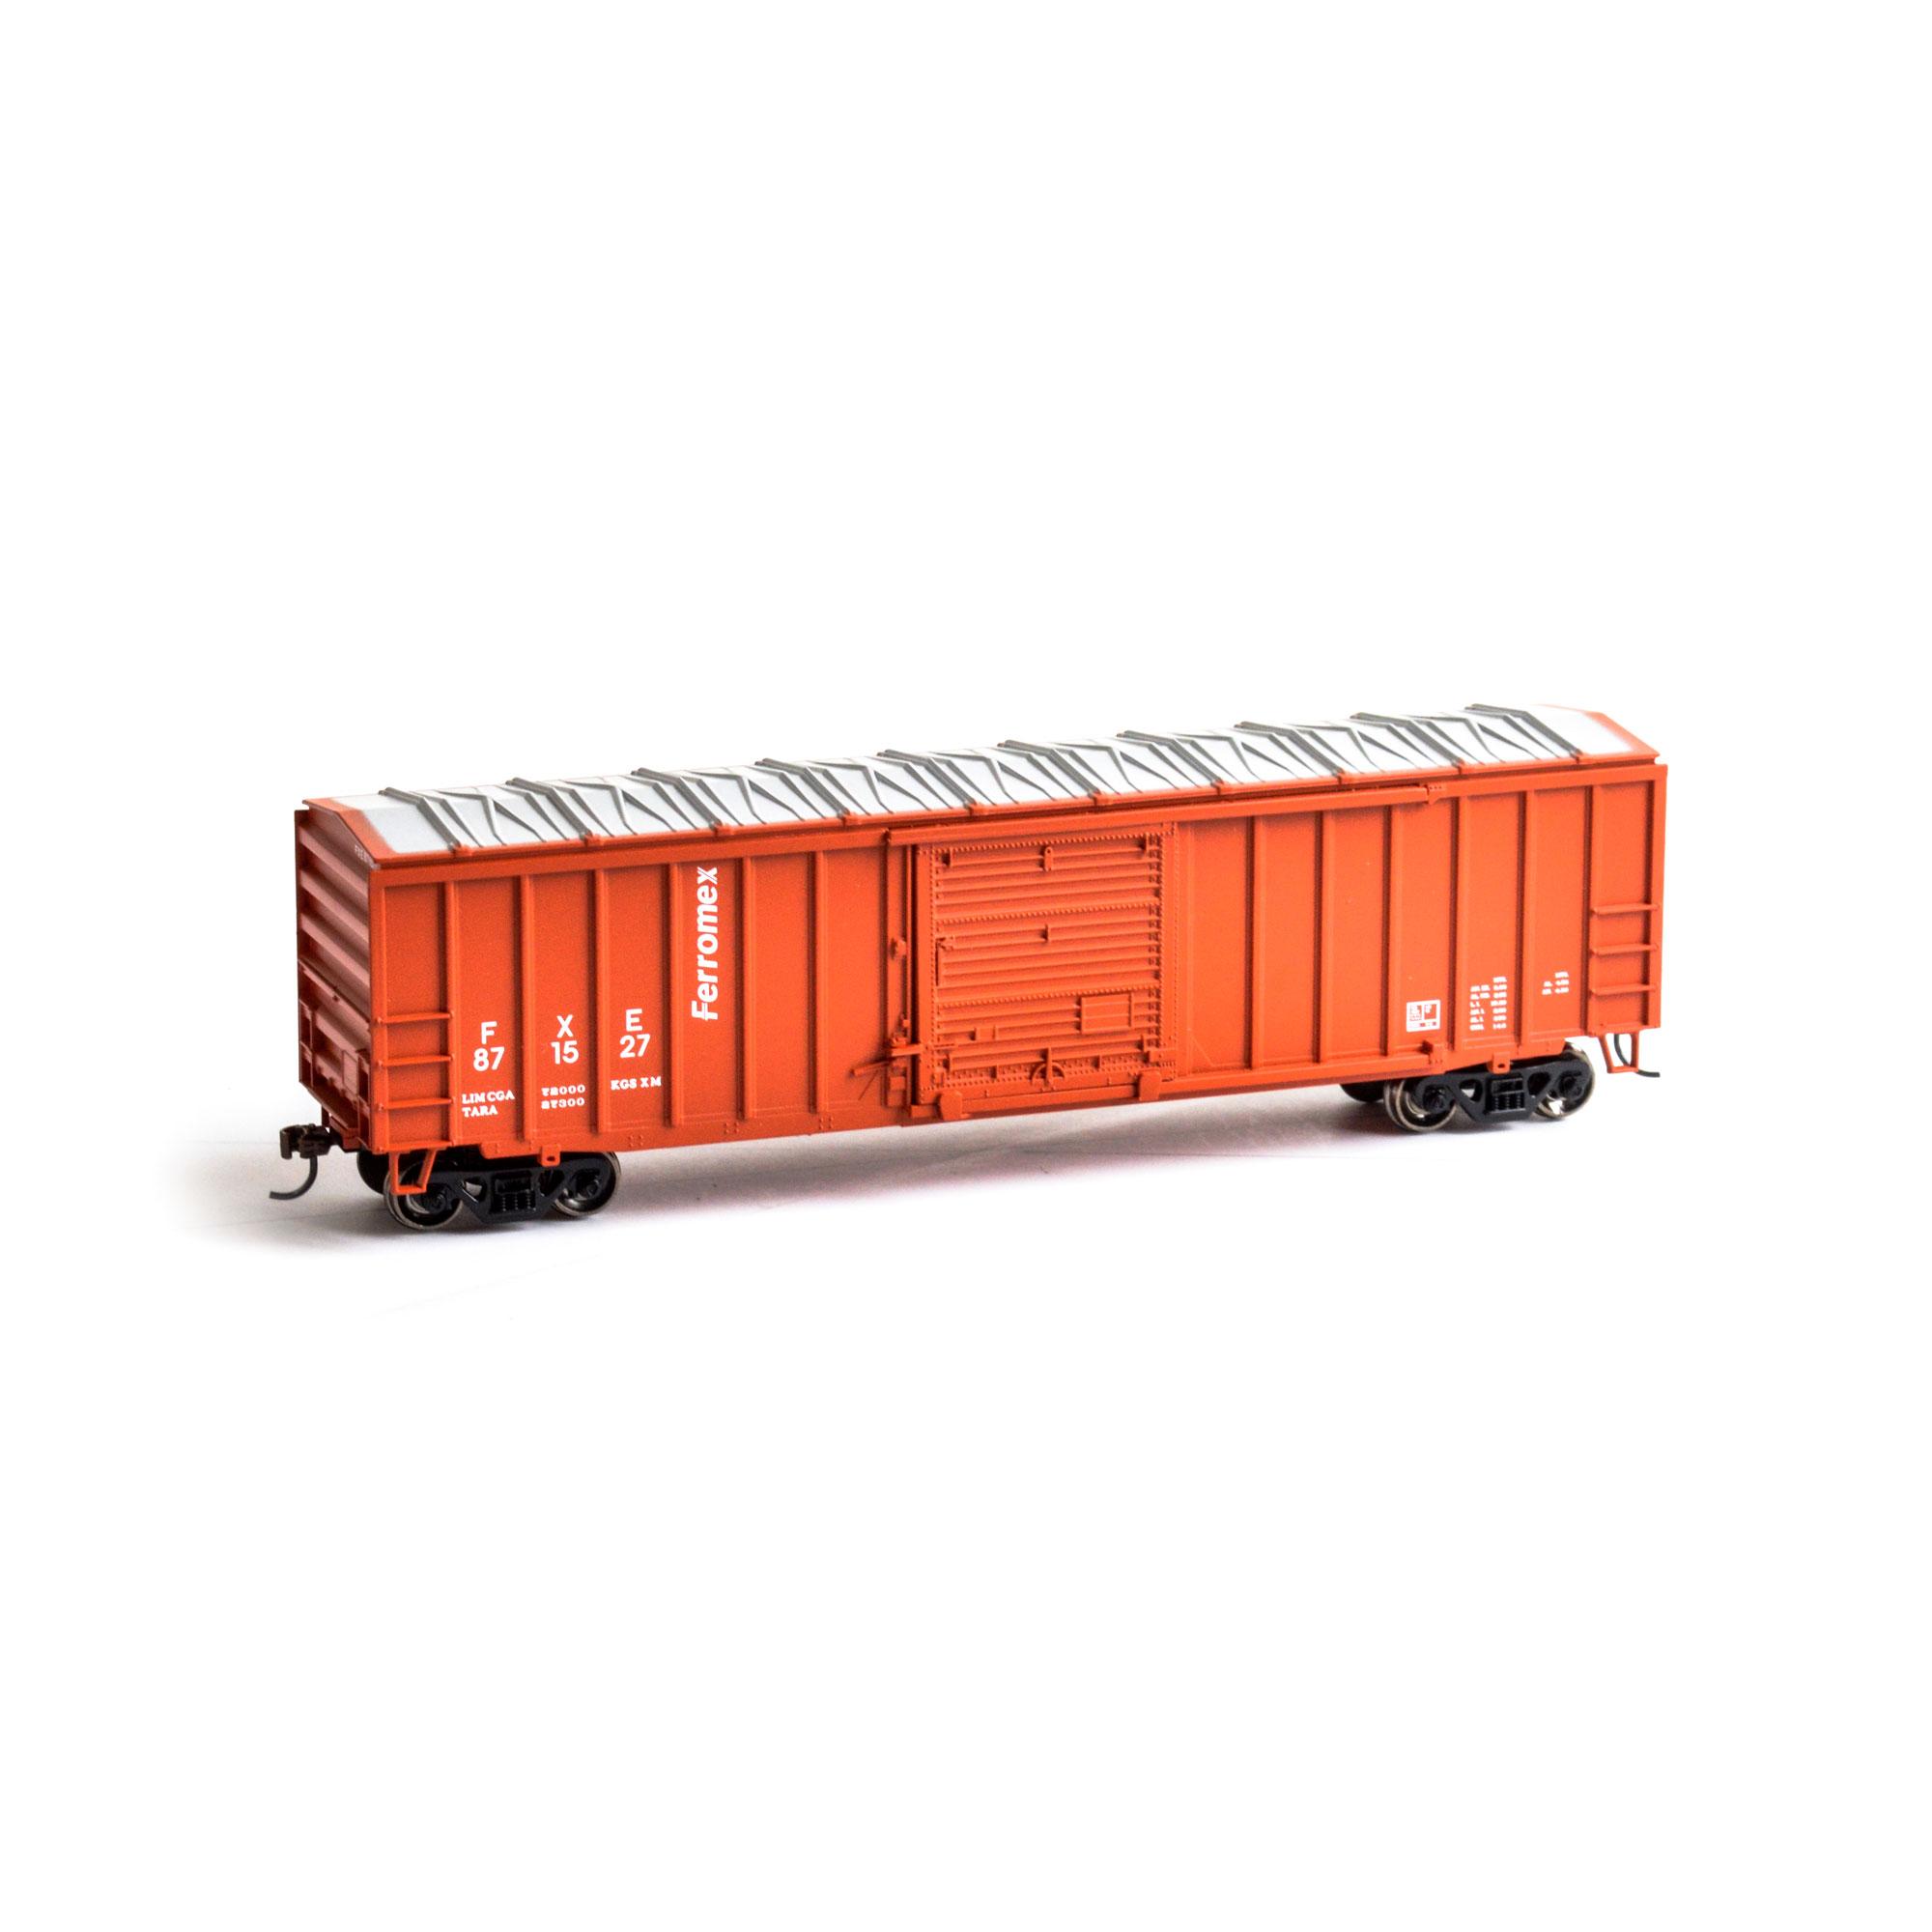 Athearn RND HO 14827- 50 ft ACF OP Box - Ferromex #871516